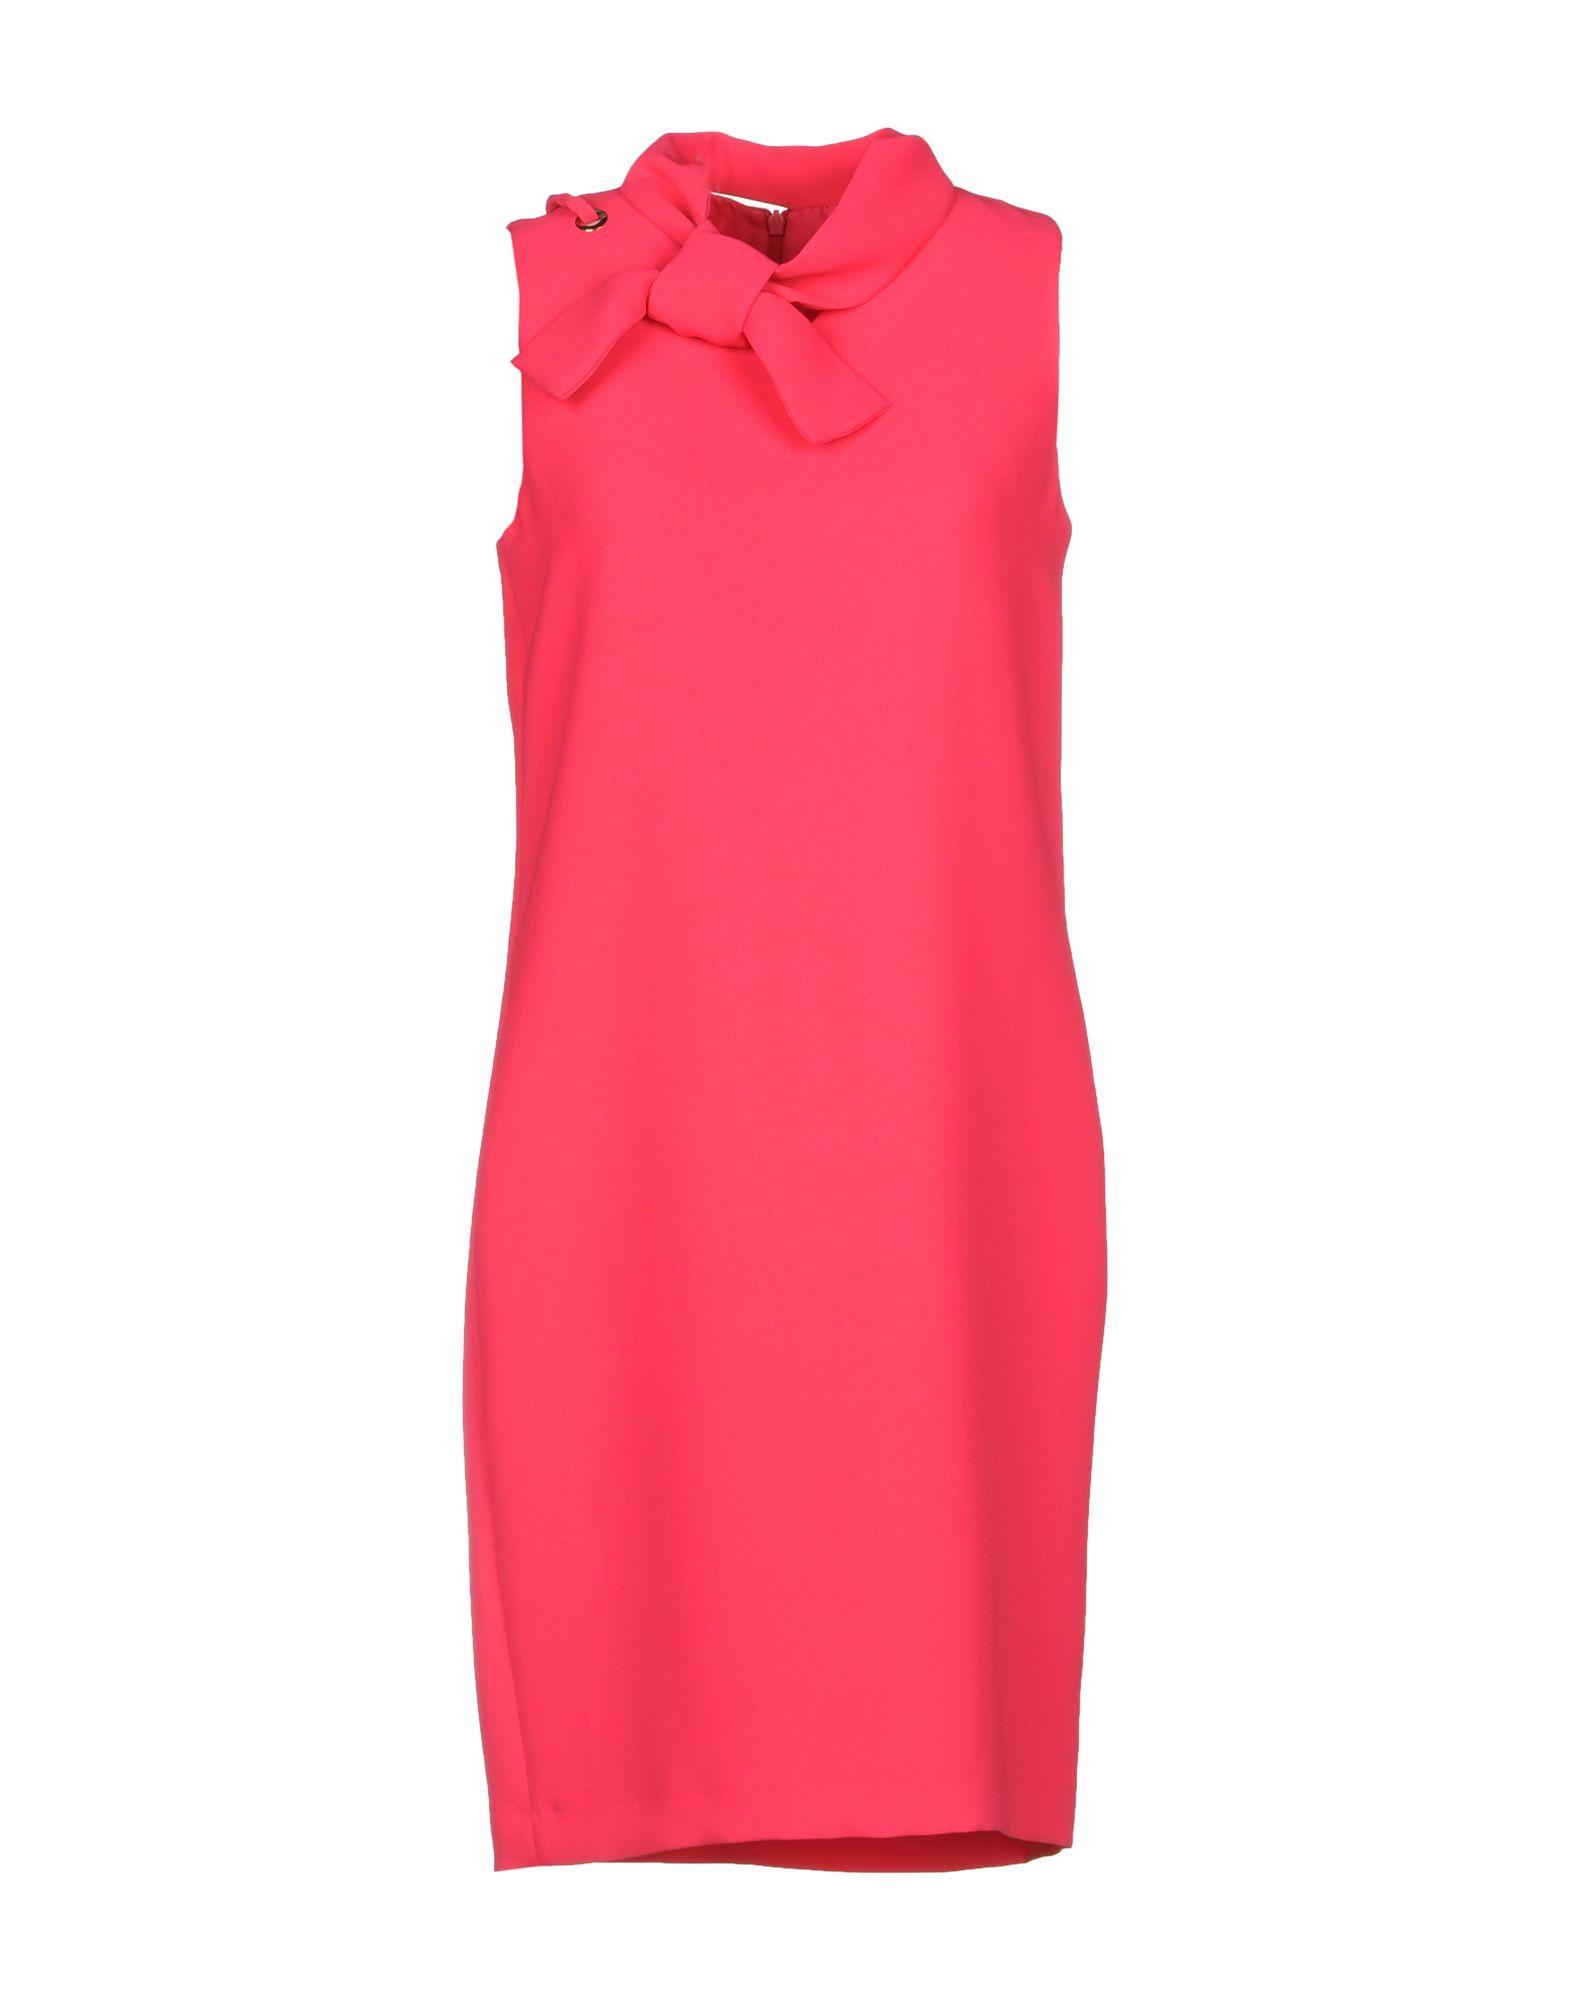 TARA JARMON Short Dress in Fuchsia